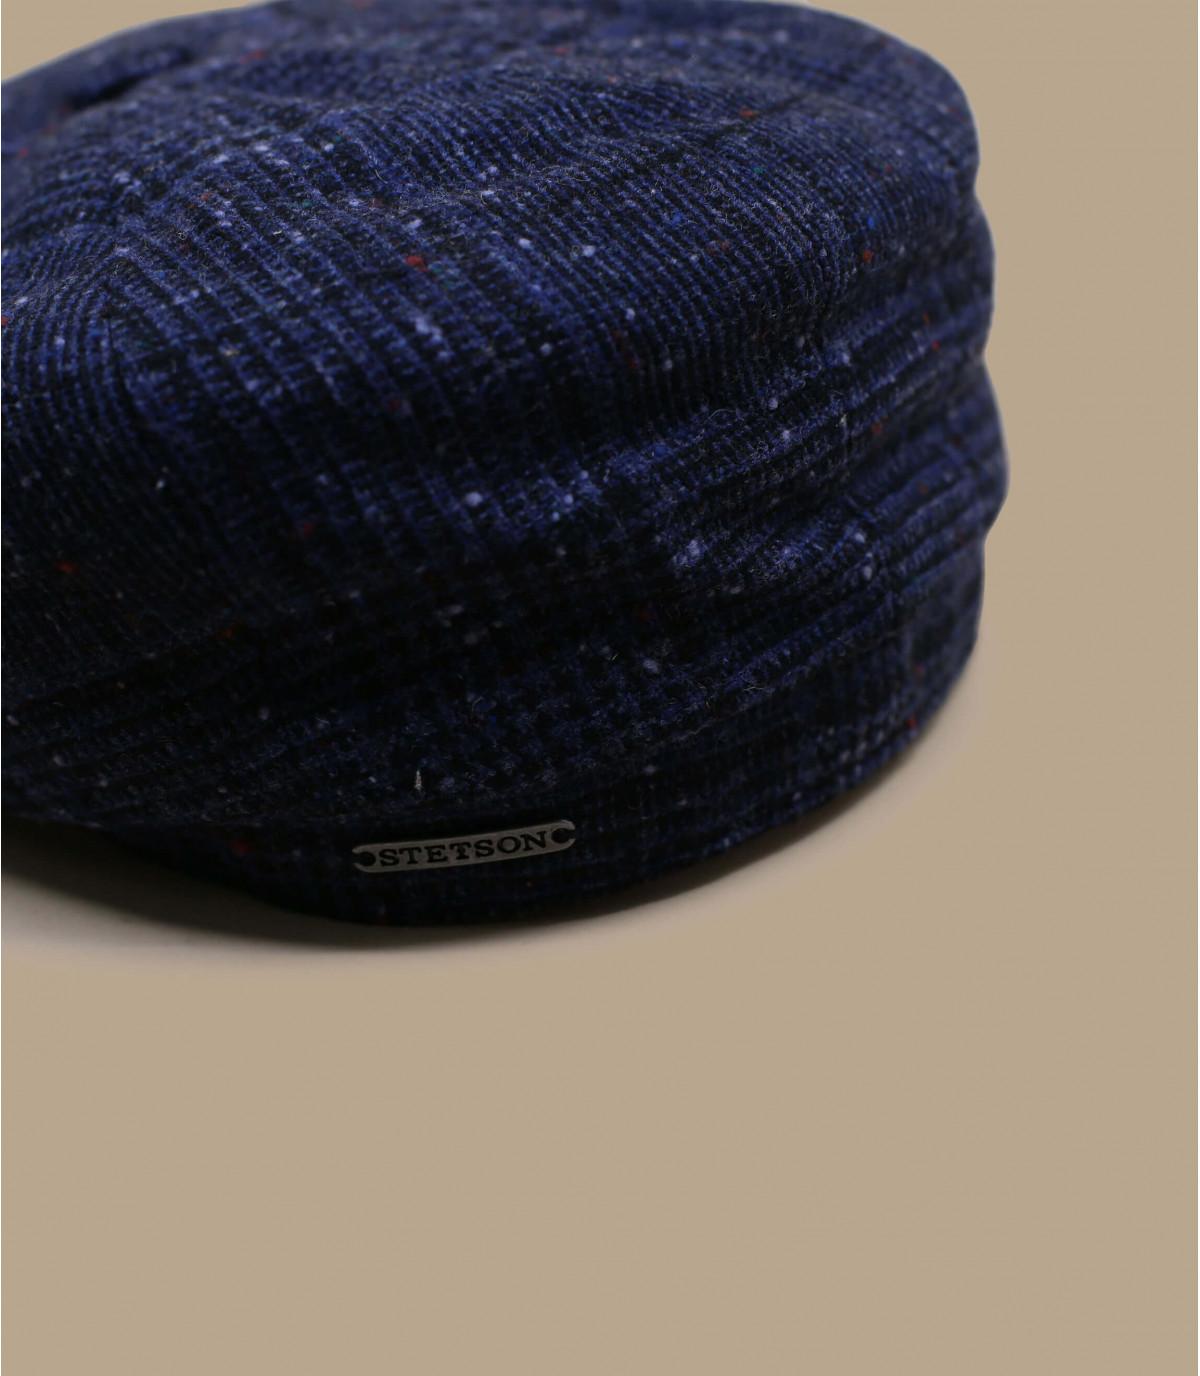 Detalles Hatteras Wool blue check imagen 2